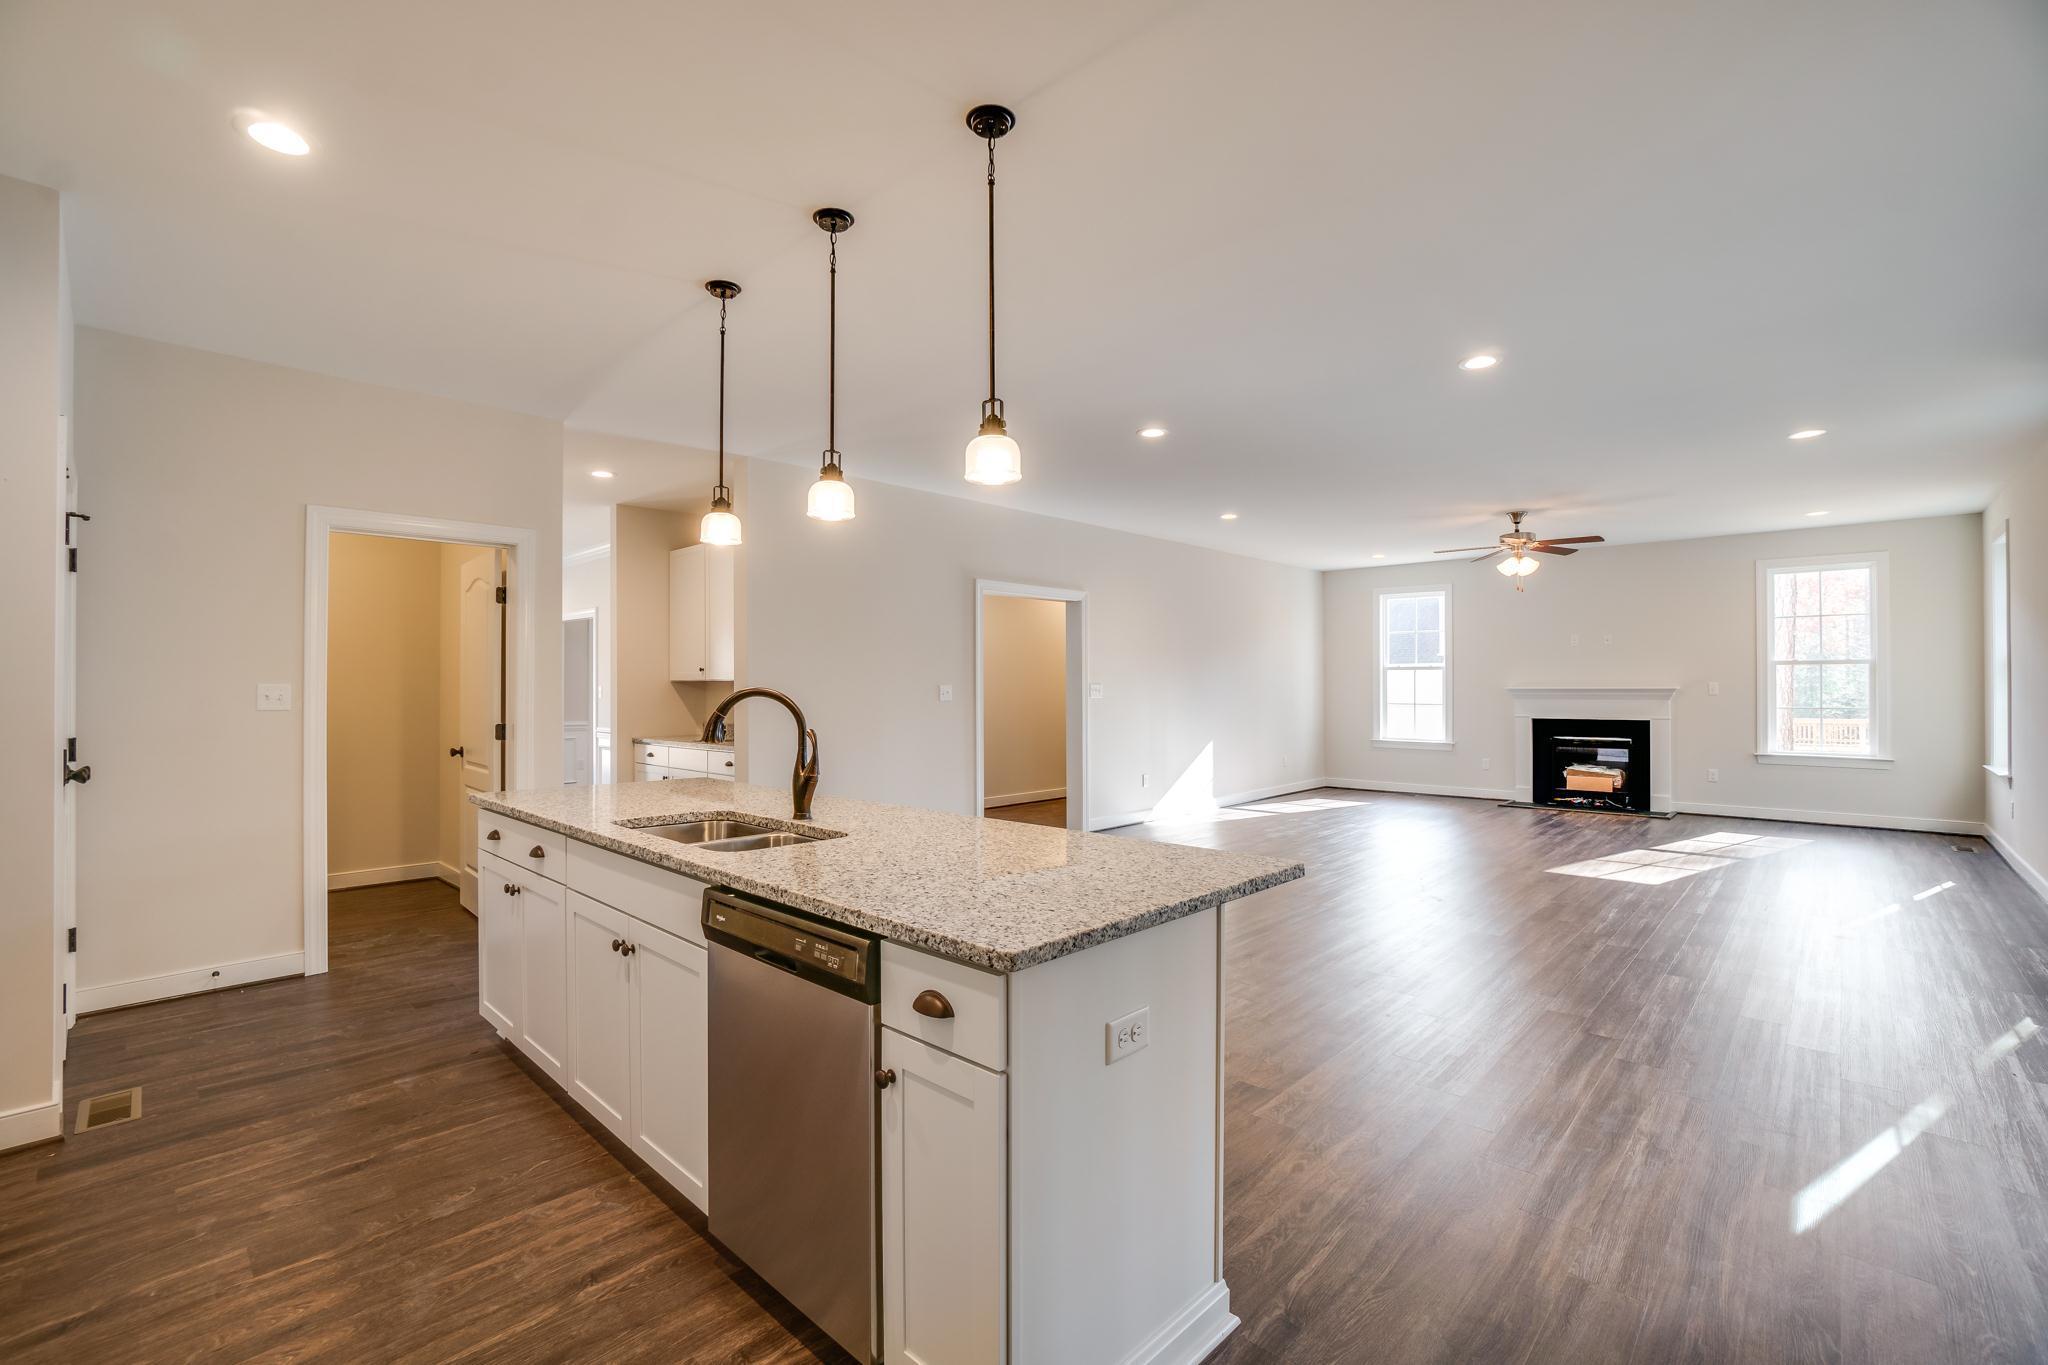 Kitchen featured in The Wellsley By West Homes in Richmond-Petersburg, VA